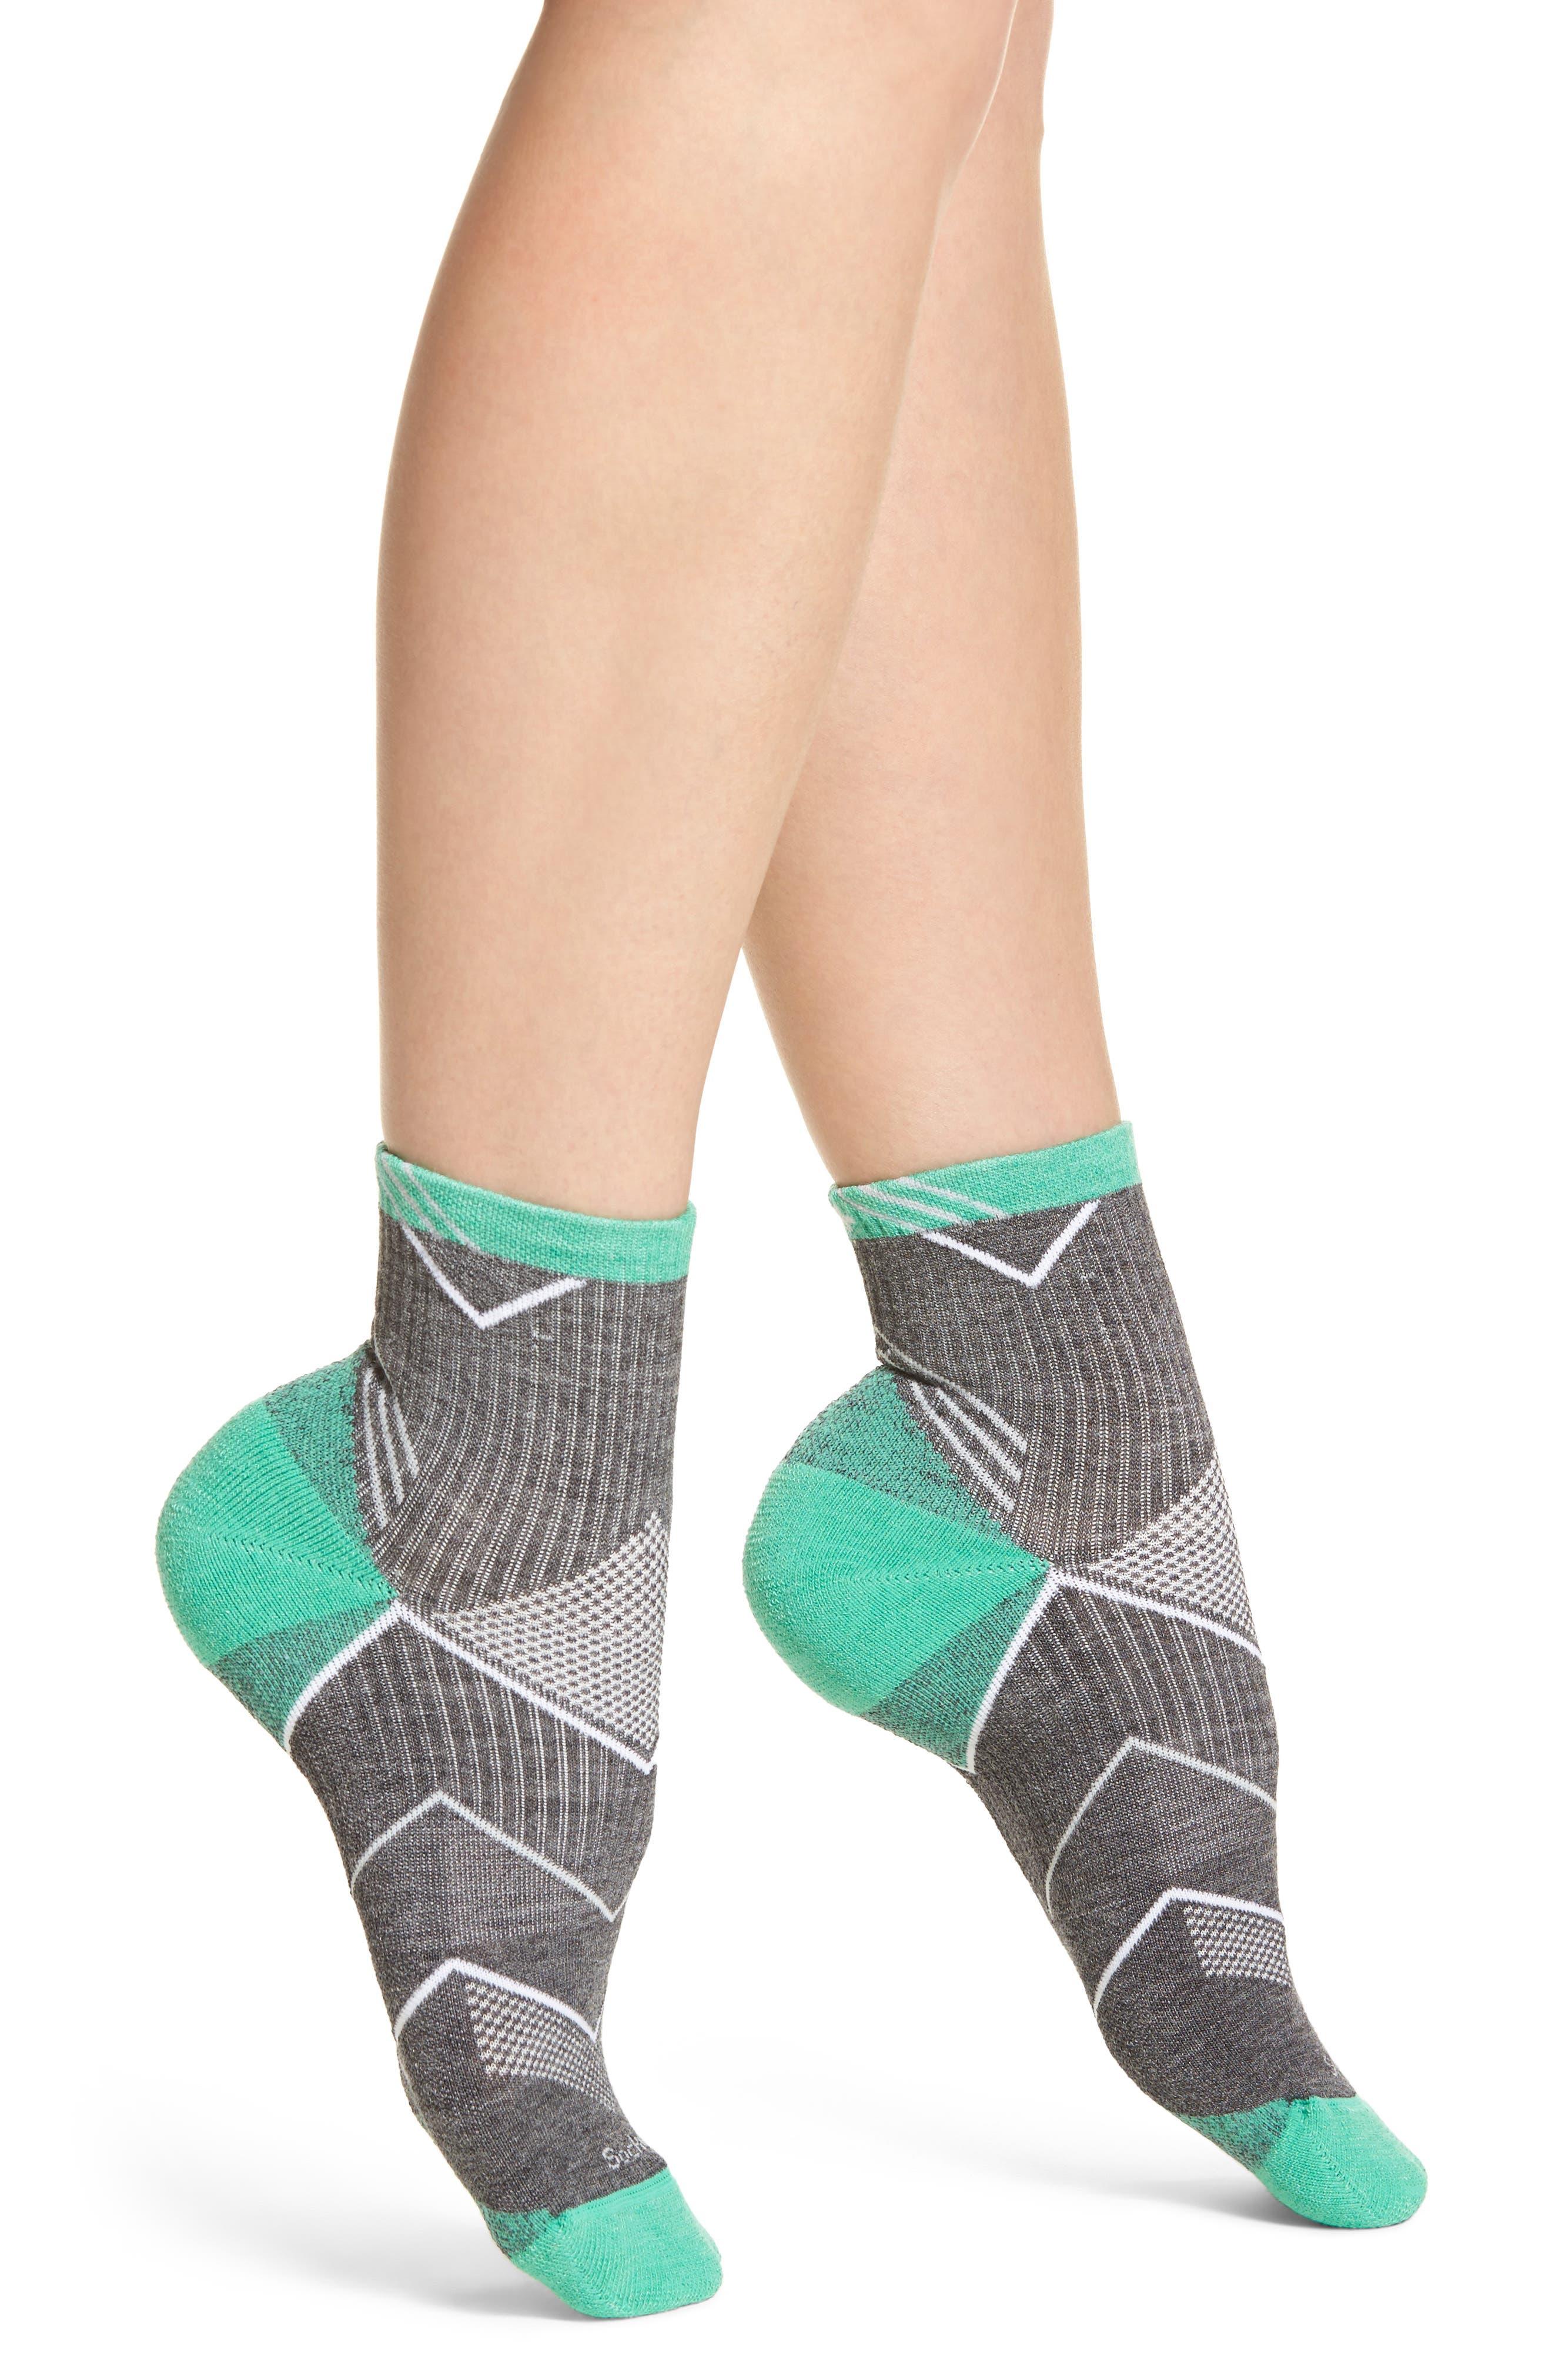 Quarter Socks,                         Main,                         color, 020